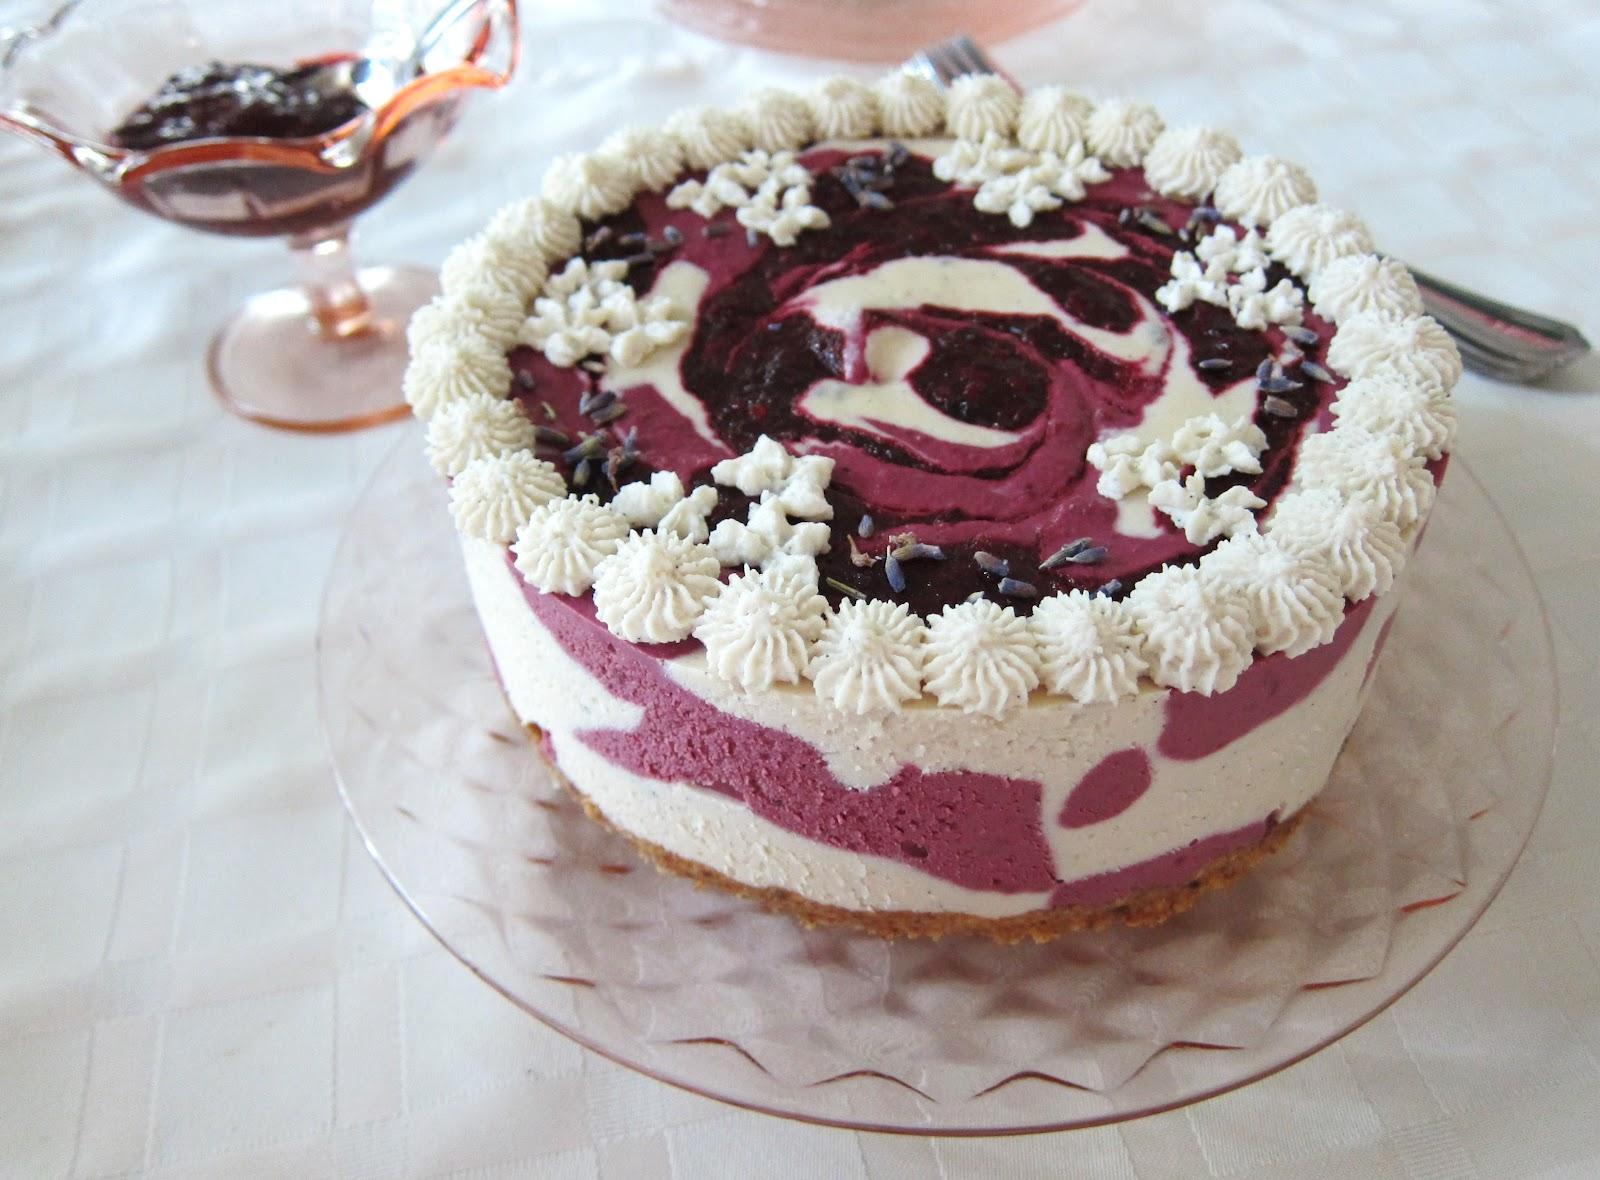 Raw Blackberry Lemon Lavender Cheesecake Fragrant Vanilla Cake